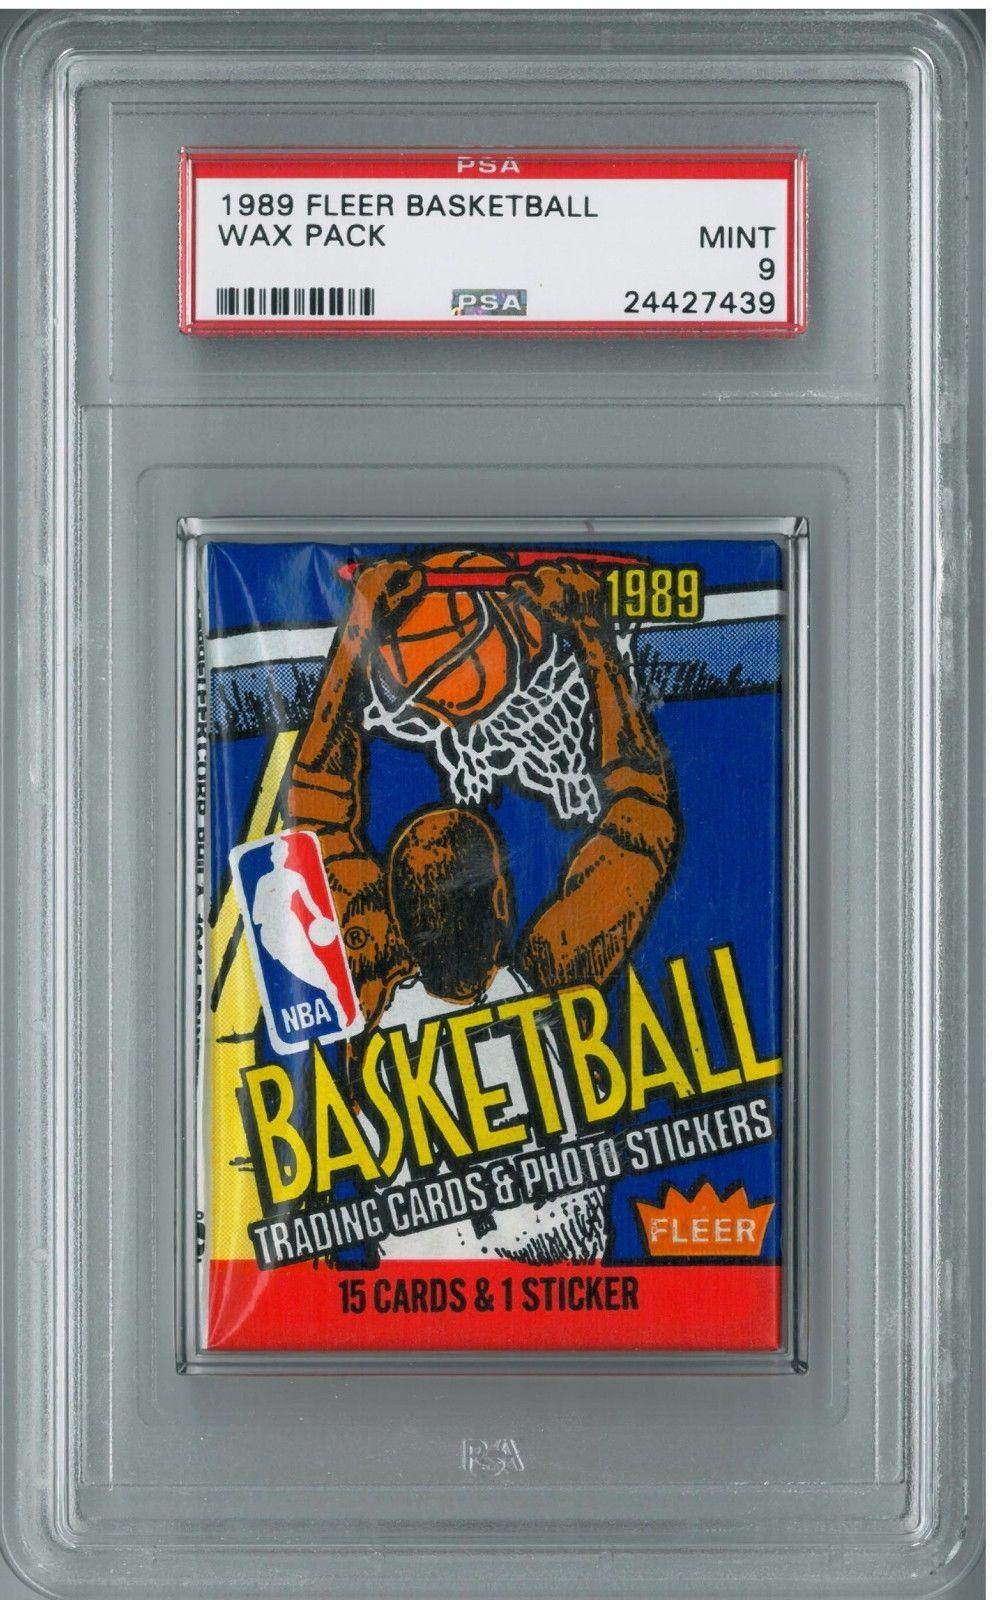 1989 fleer basketball unopened wax pack psa 9 mint